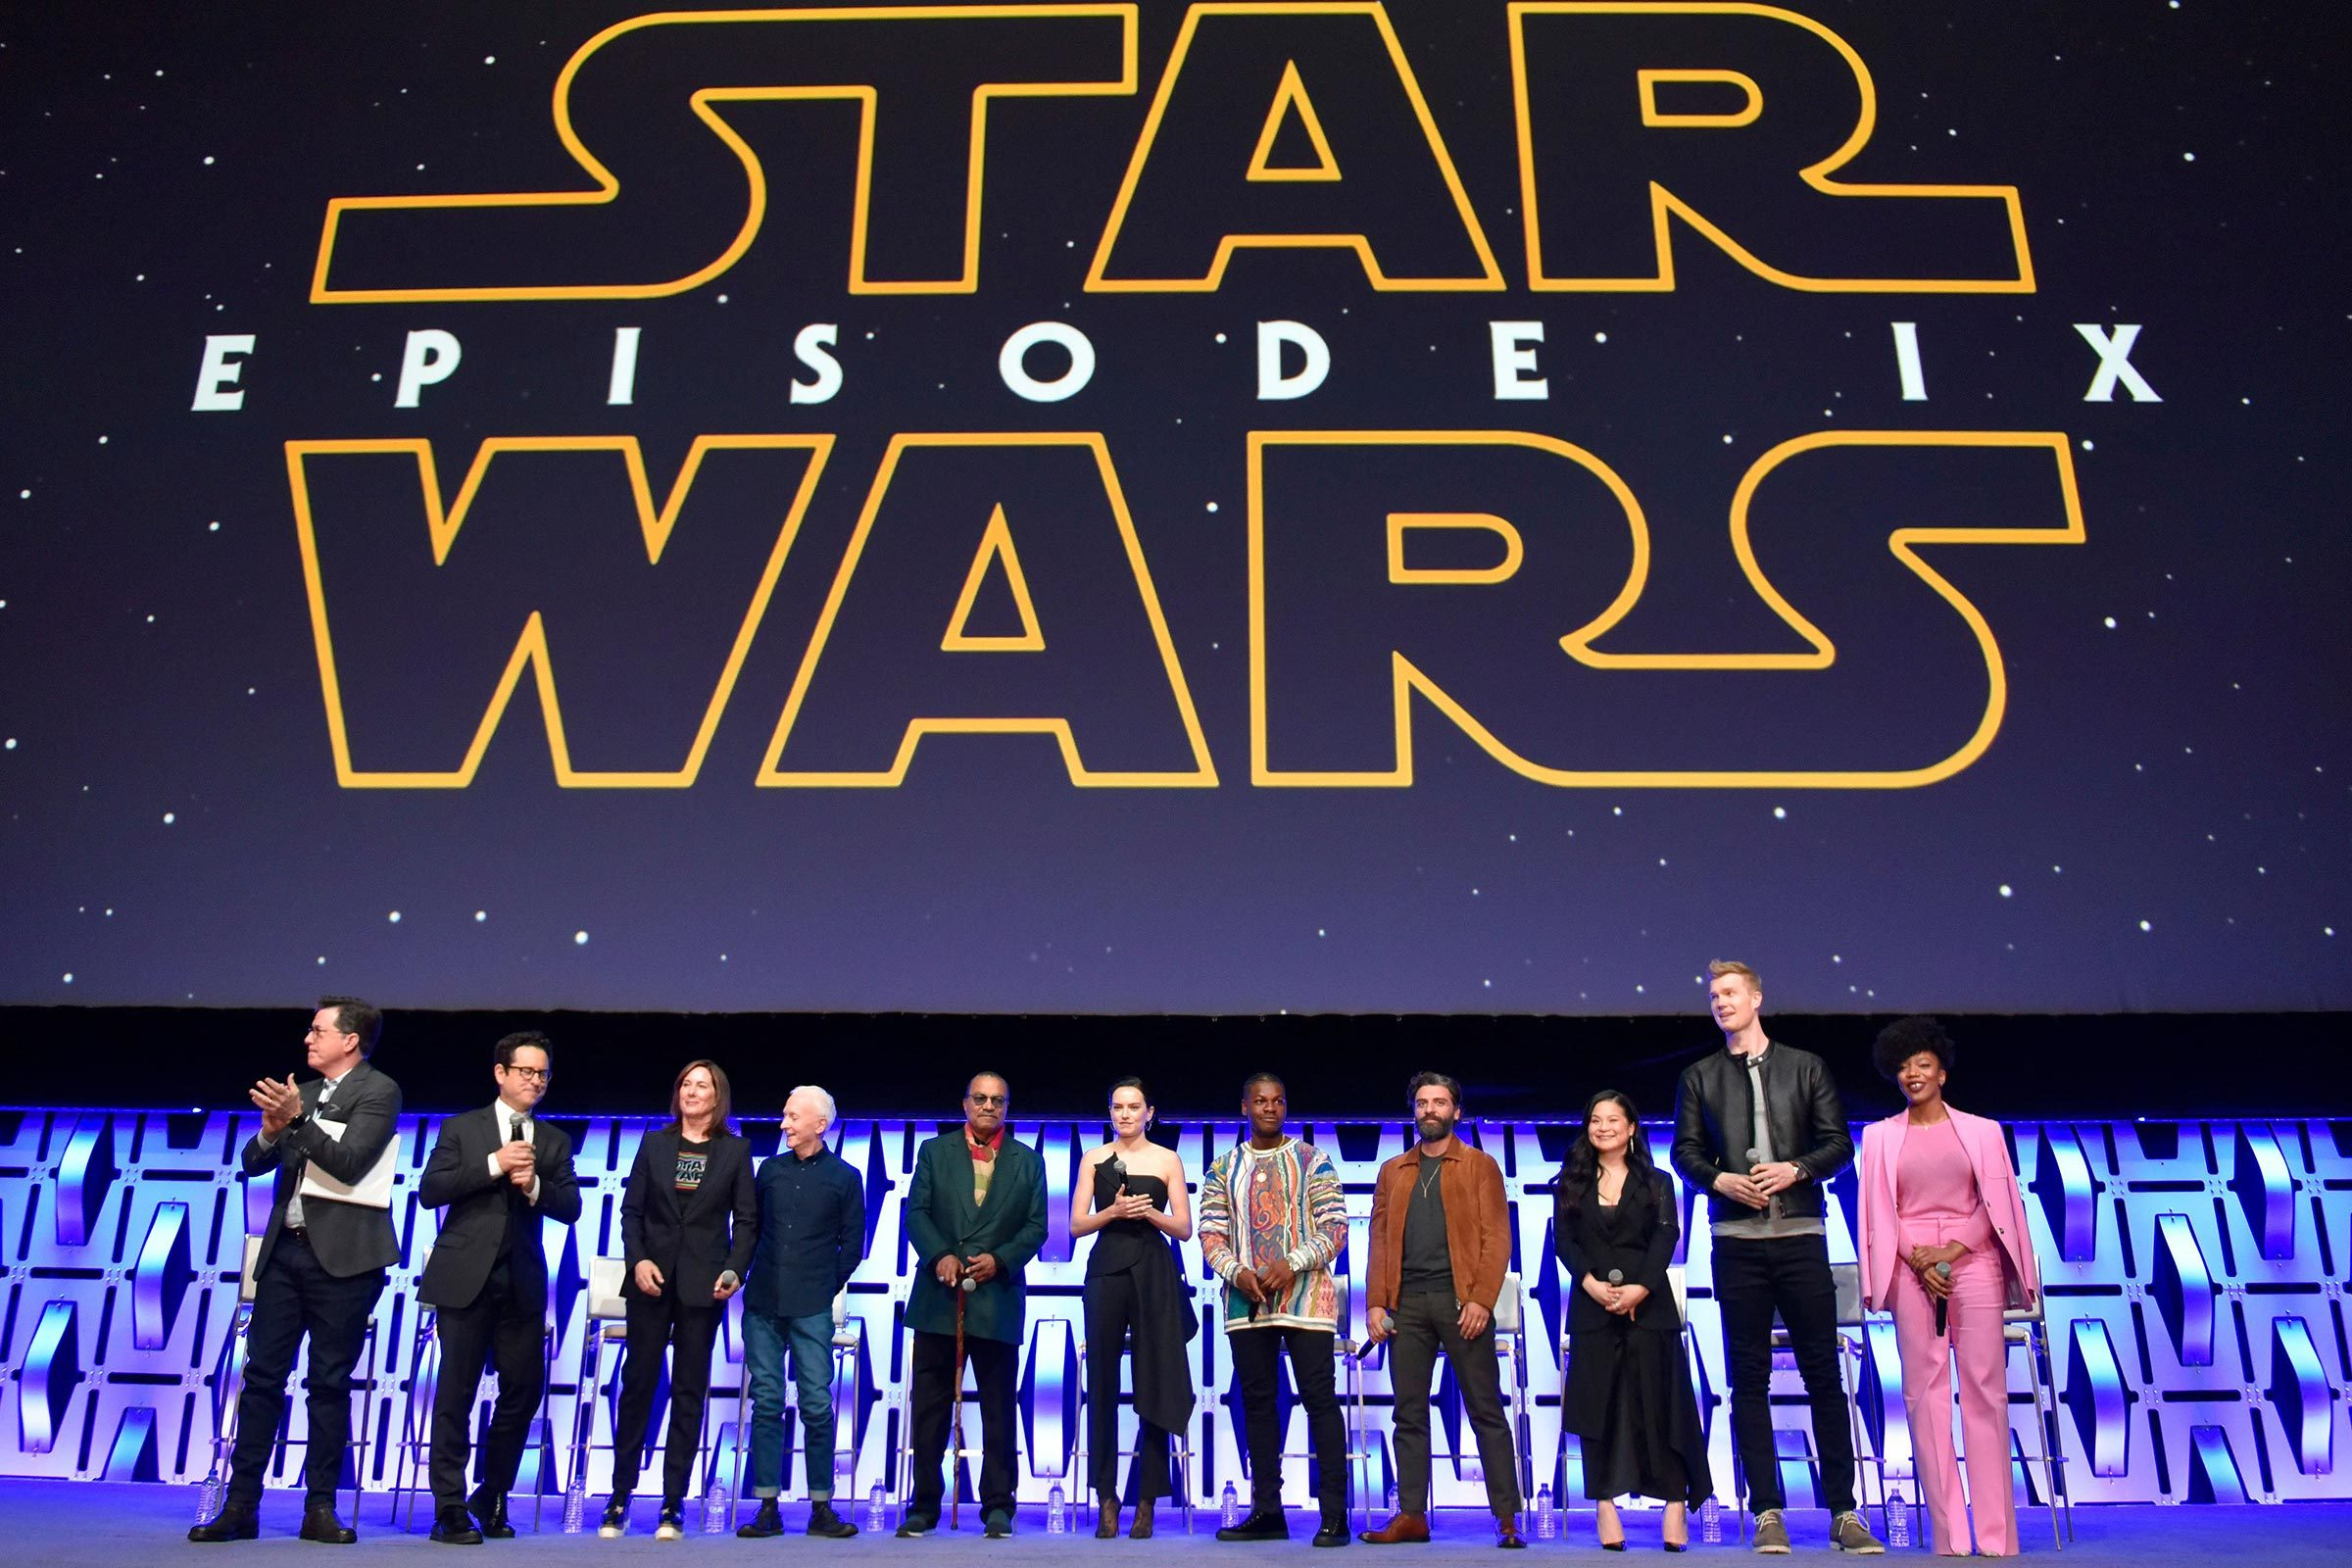 star wars panel celebration event